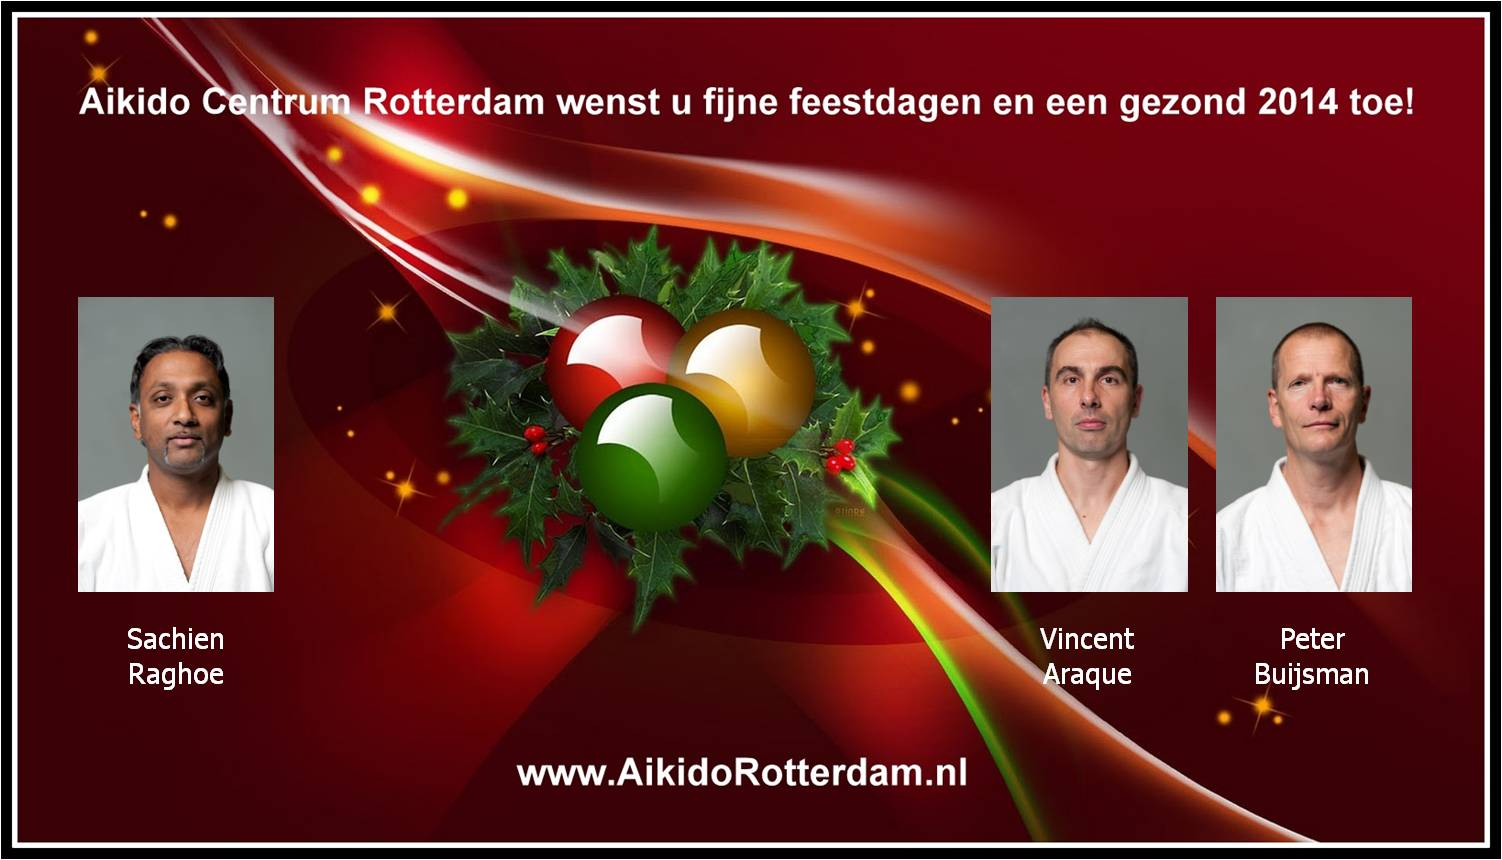 Aikido Centrum Rotterdam Kerst/Nieuwjaar groet 2013